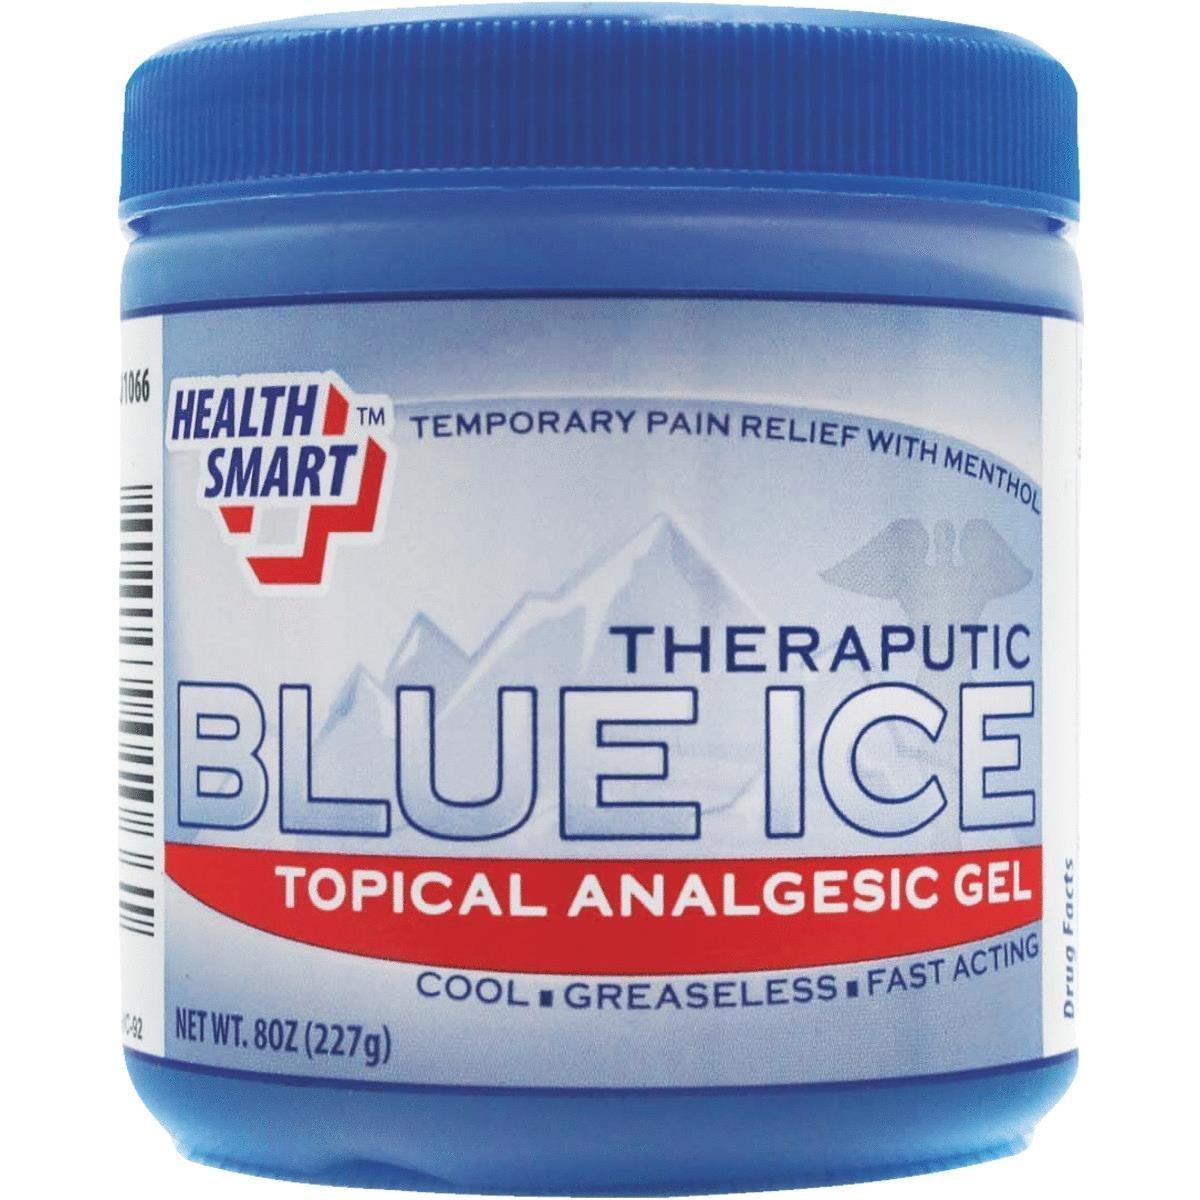 Blue Ice Gel Health Smart Tropical Analgesic Gel 8OZ